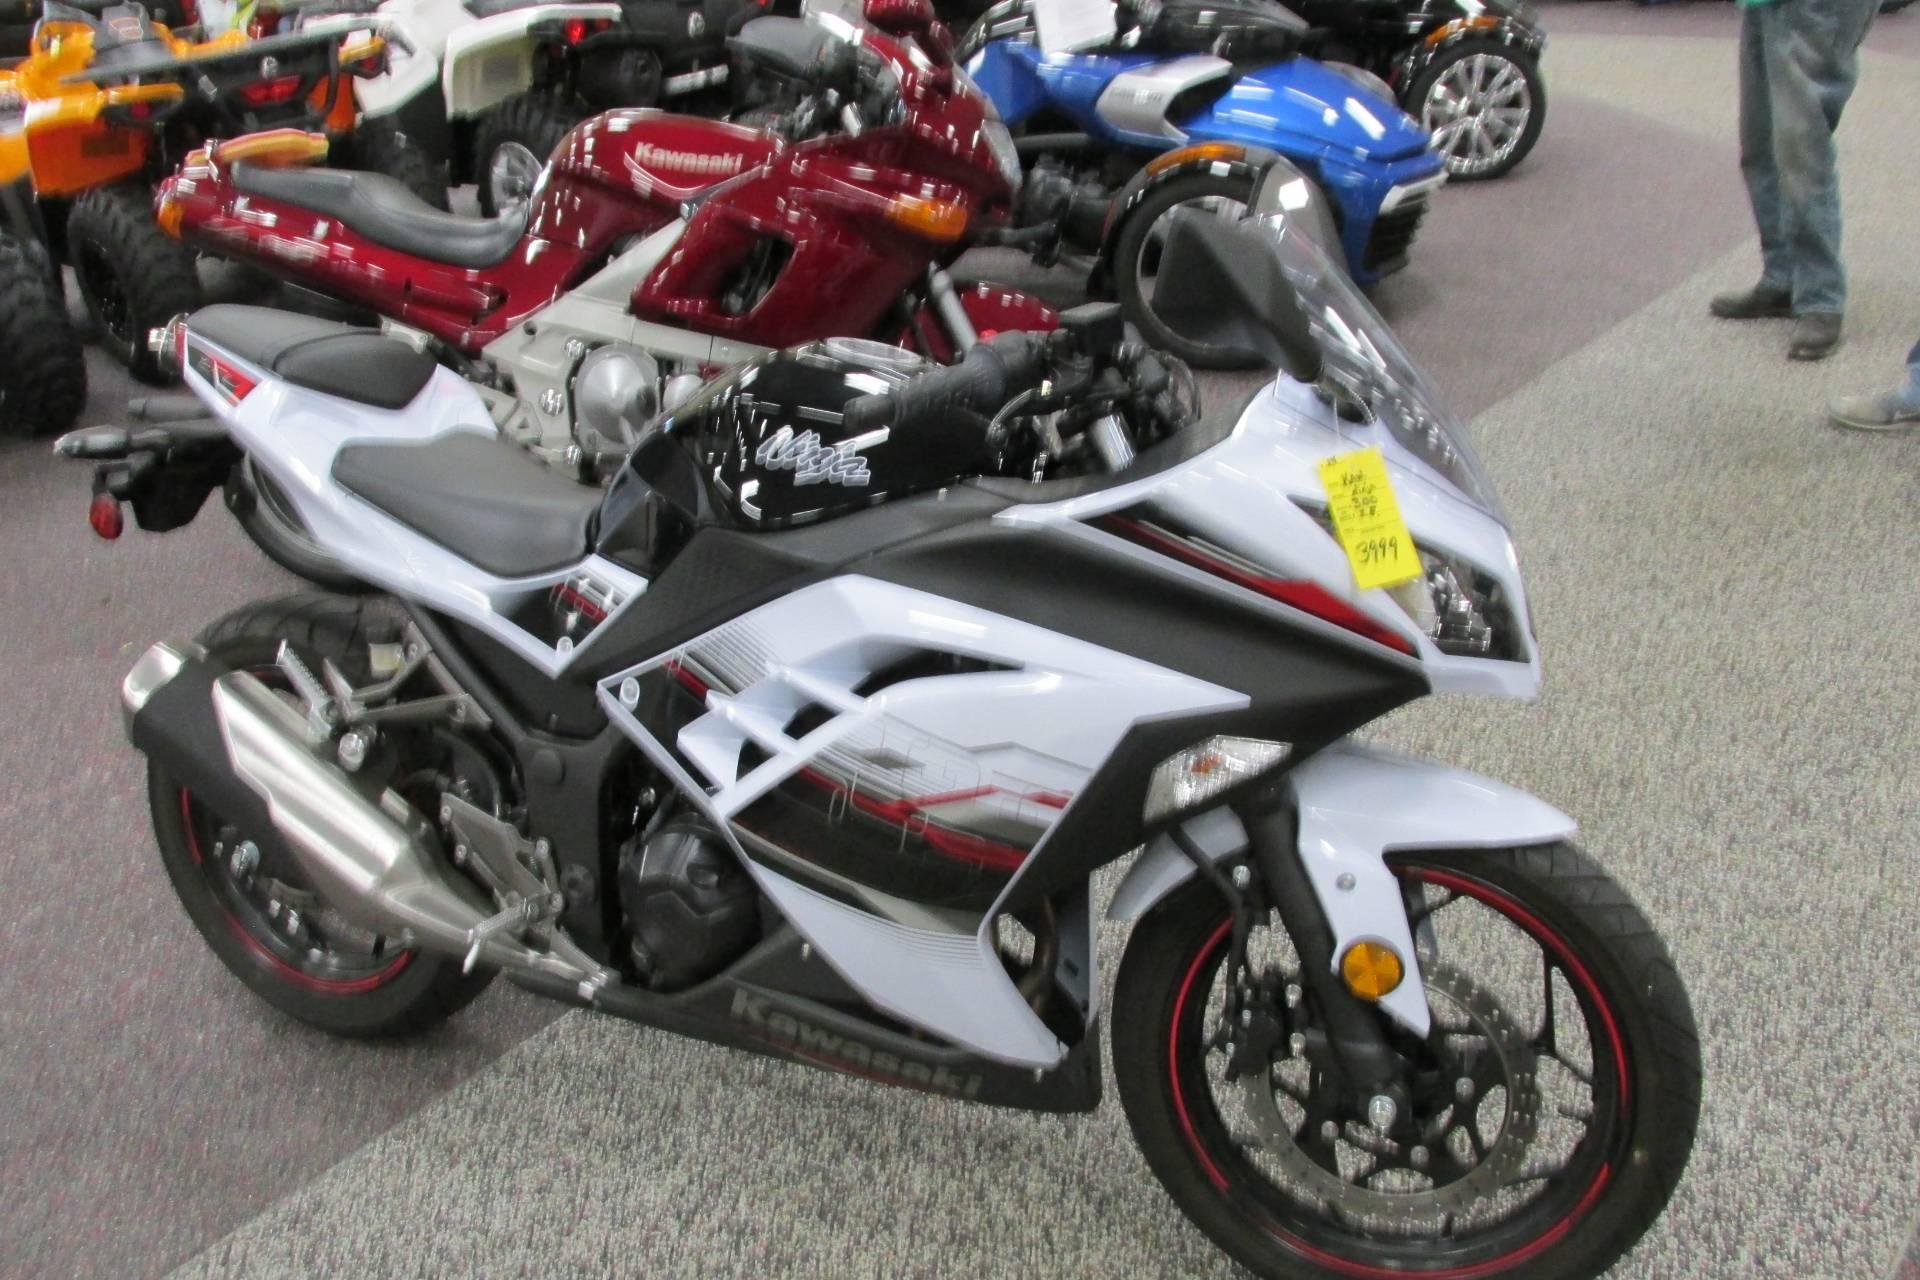 2014 Kawasaki NINJA 300 SPECIAL EDITION Motorcycles Springfield Ohio